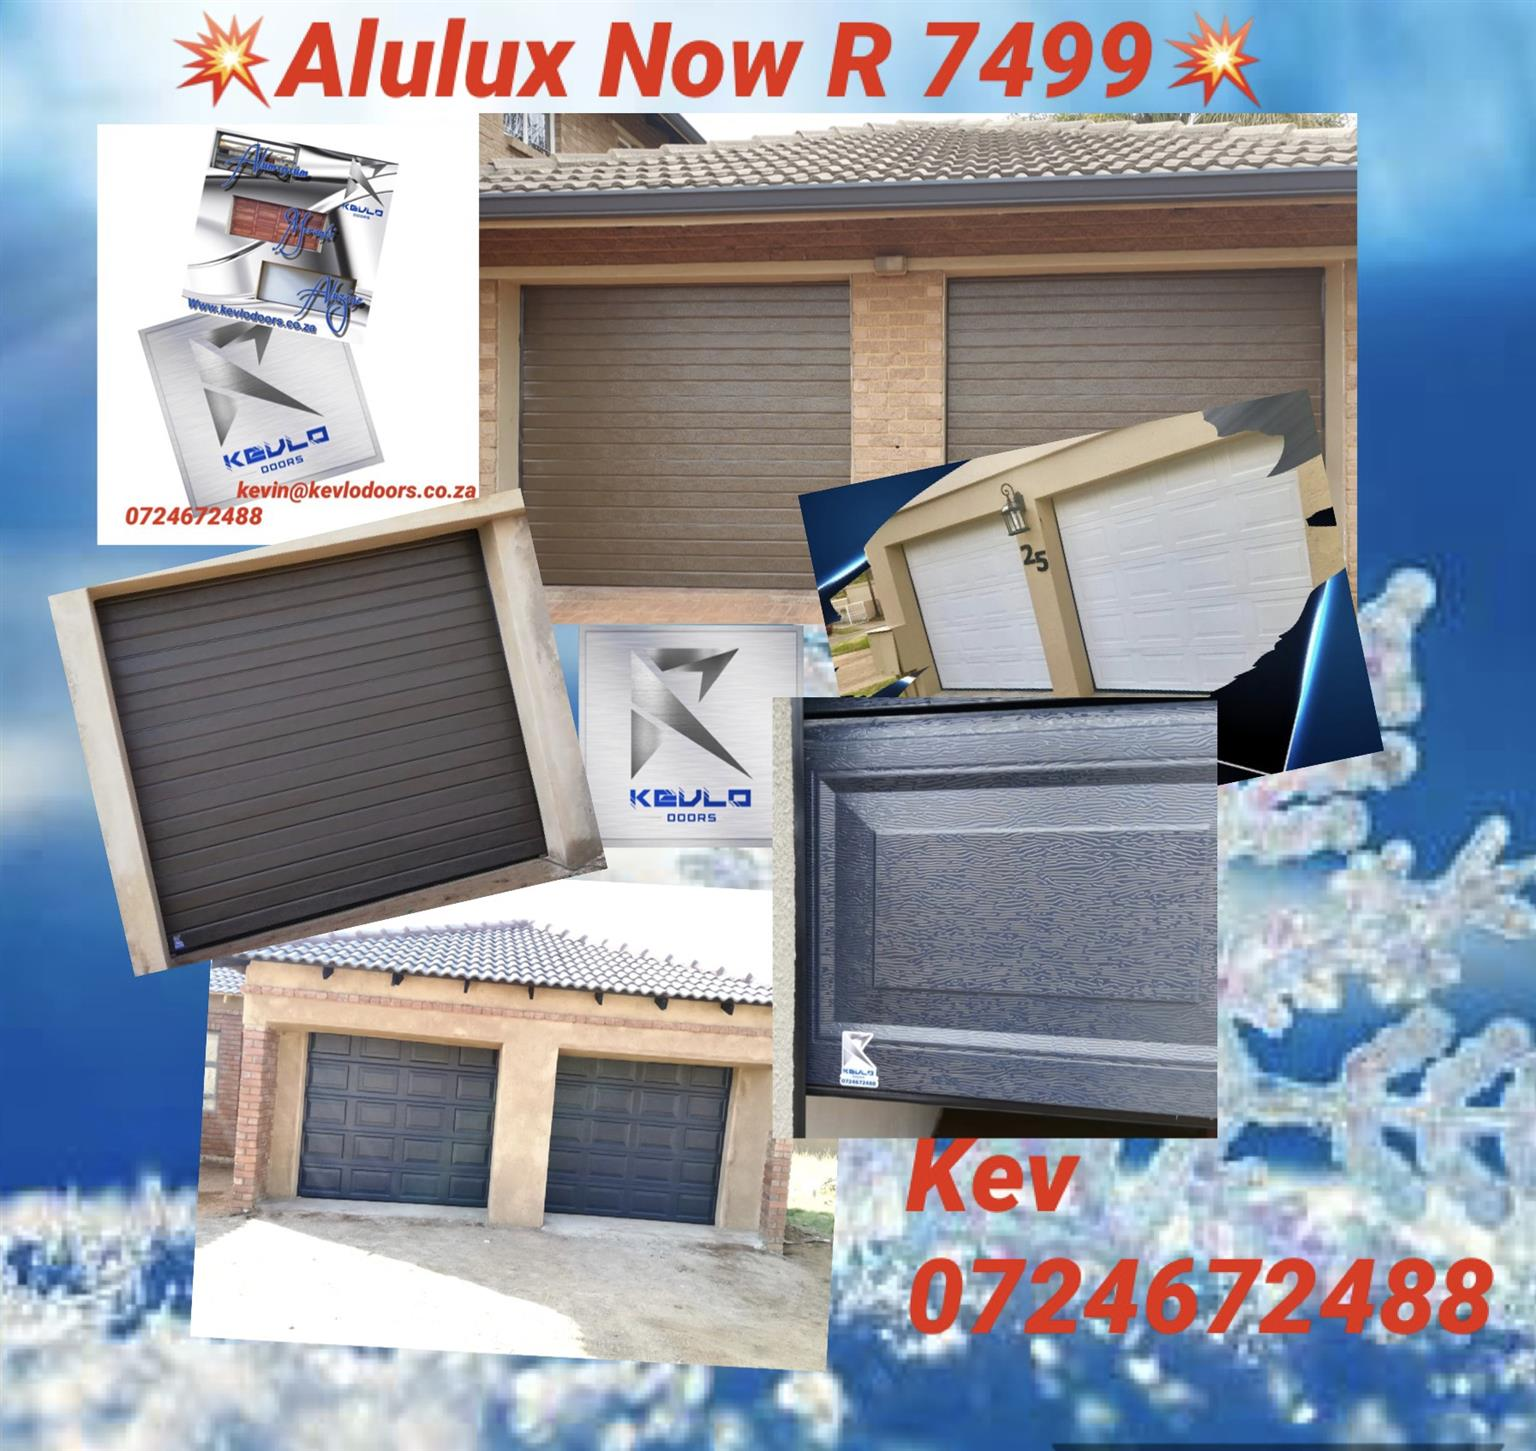 Quality Affordable Garage Doors